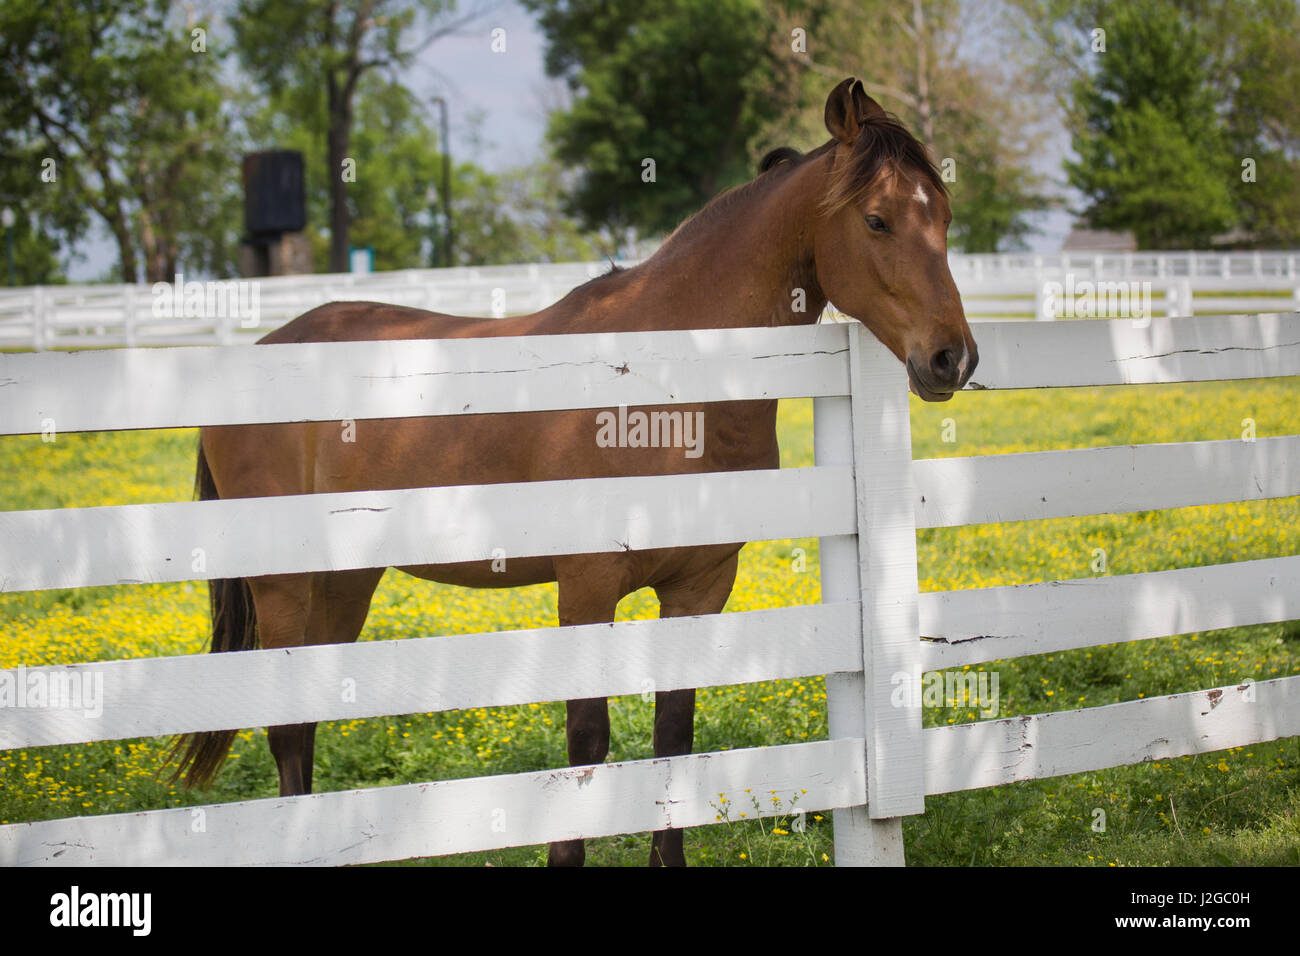 USA, Kentucky, Lexington. Horse at fence. Credit as: Don Grall / Jaynes Gallery / DanitaDelimont.com - Stock Image